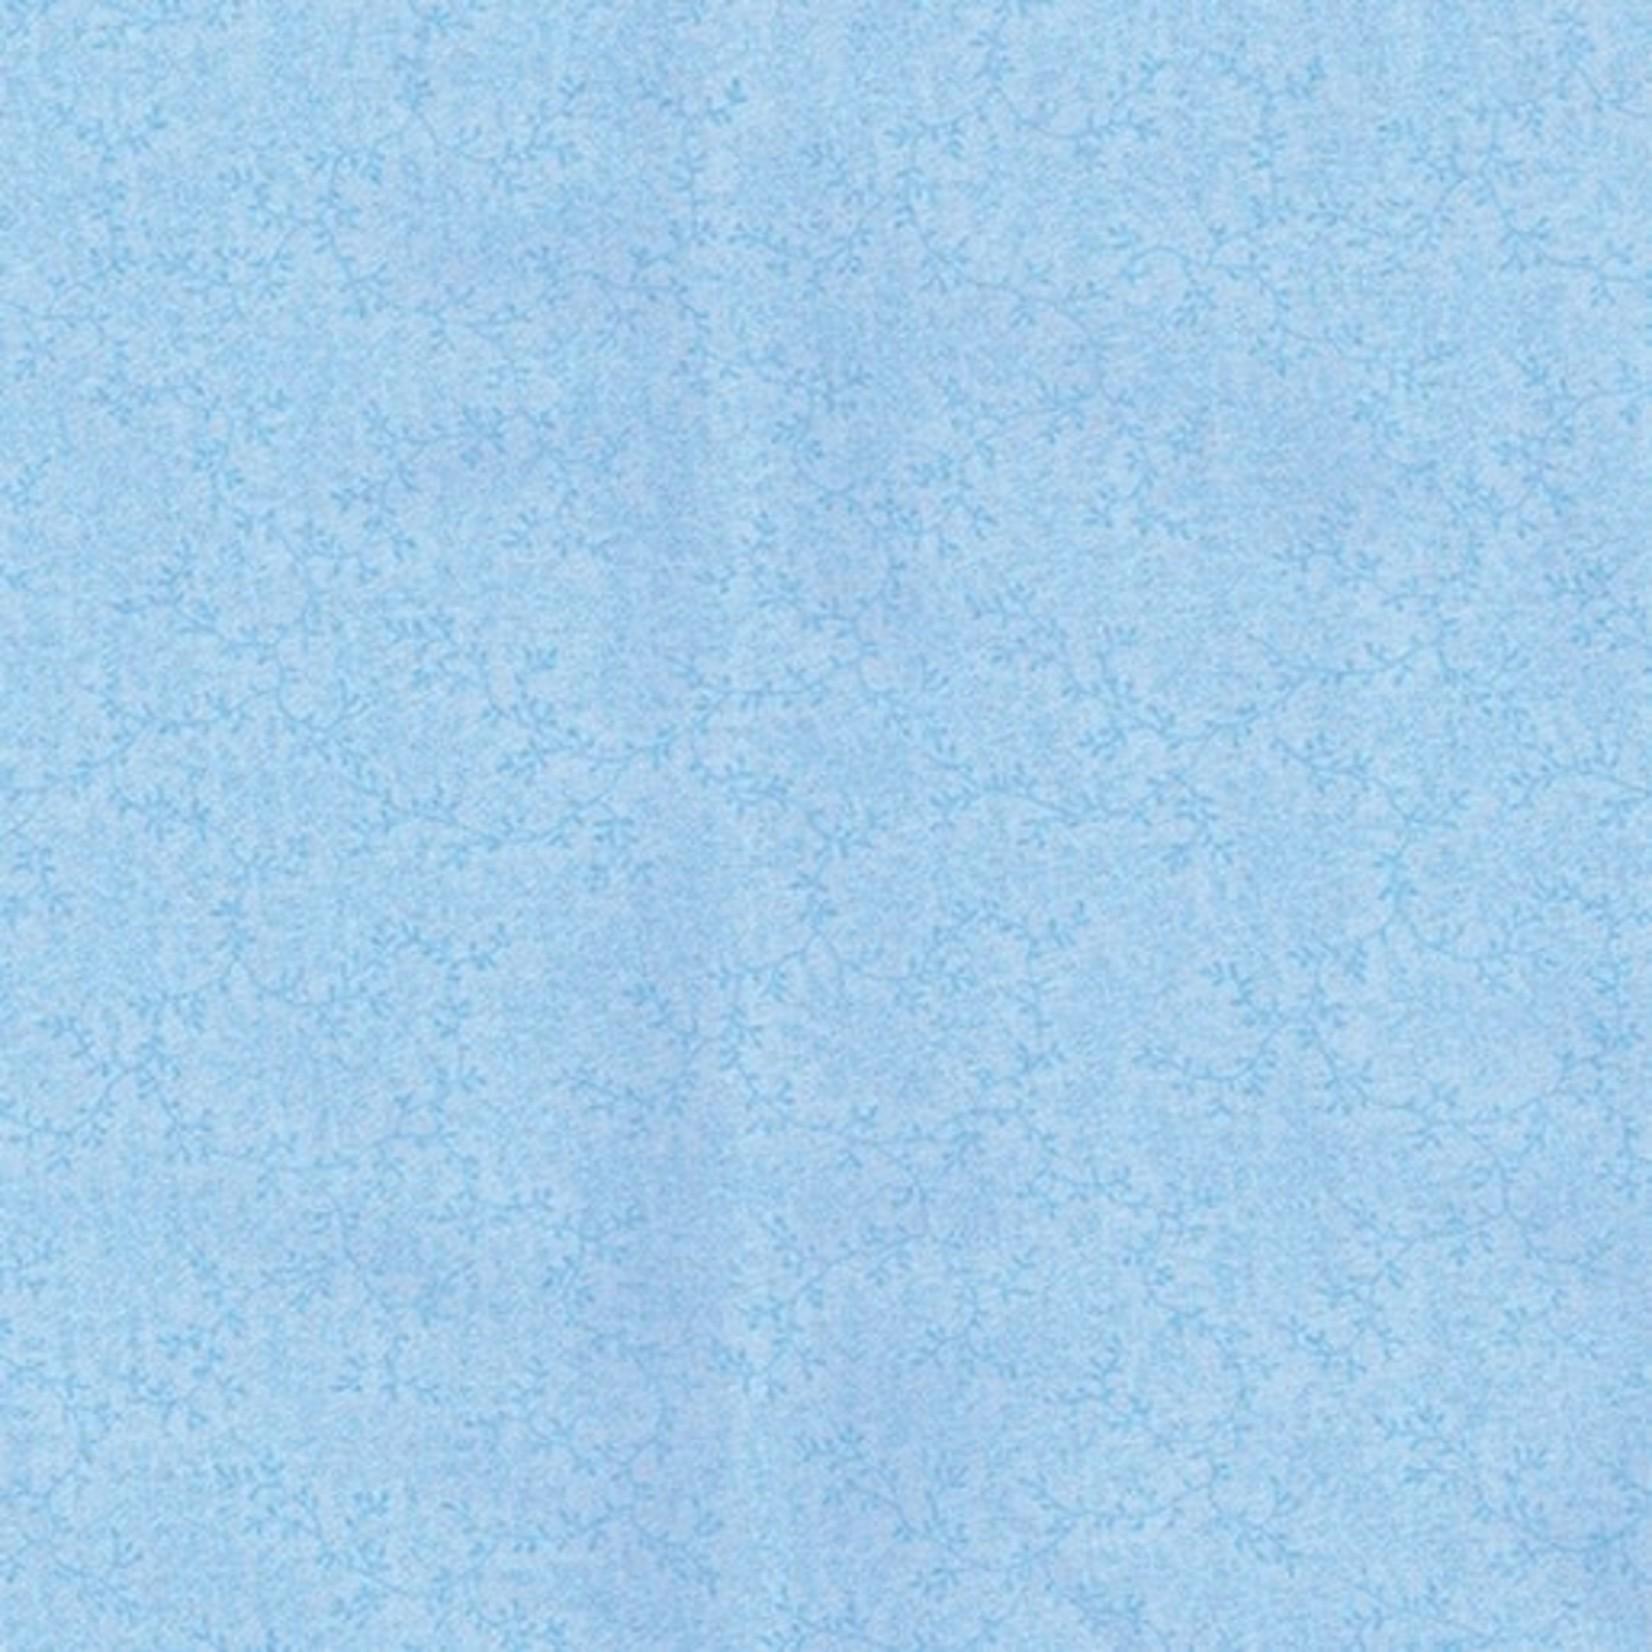 Benartex Studio Delicate Vines - Light Blue